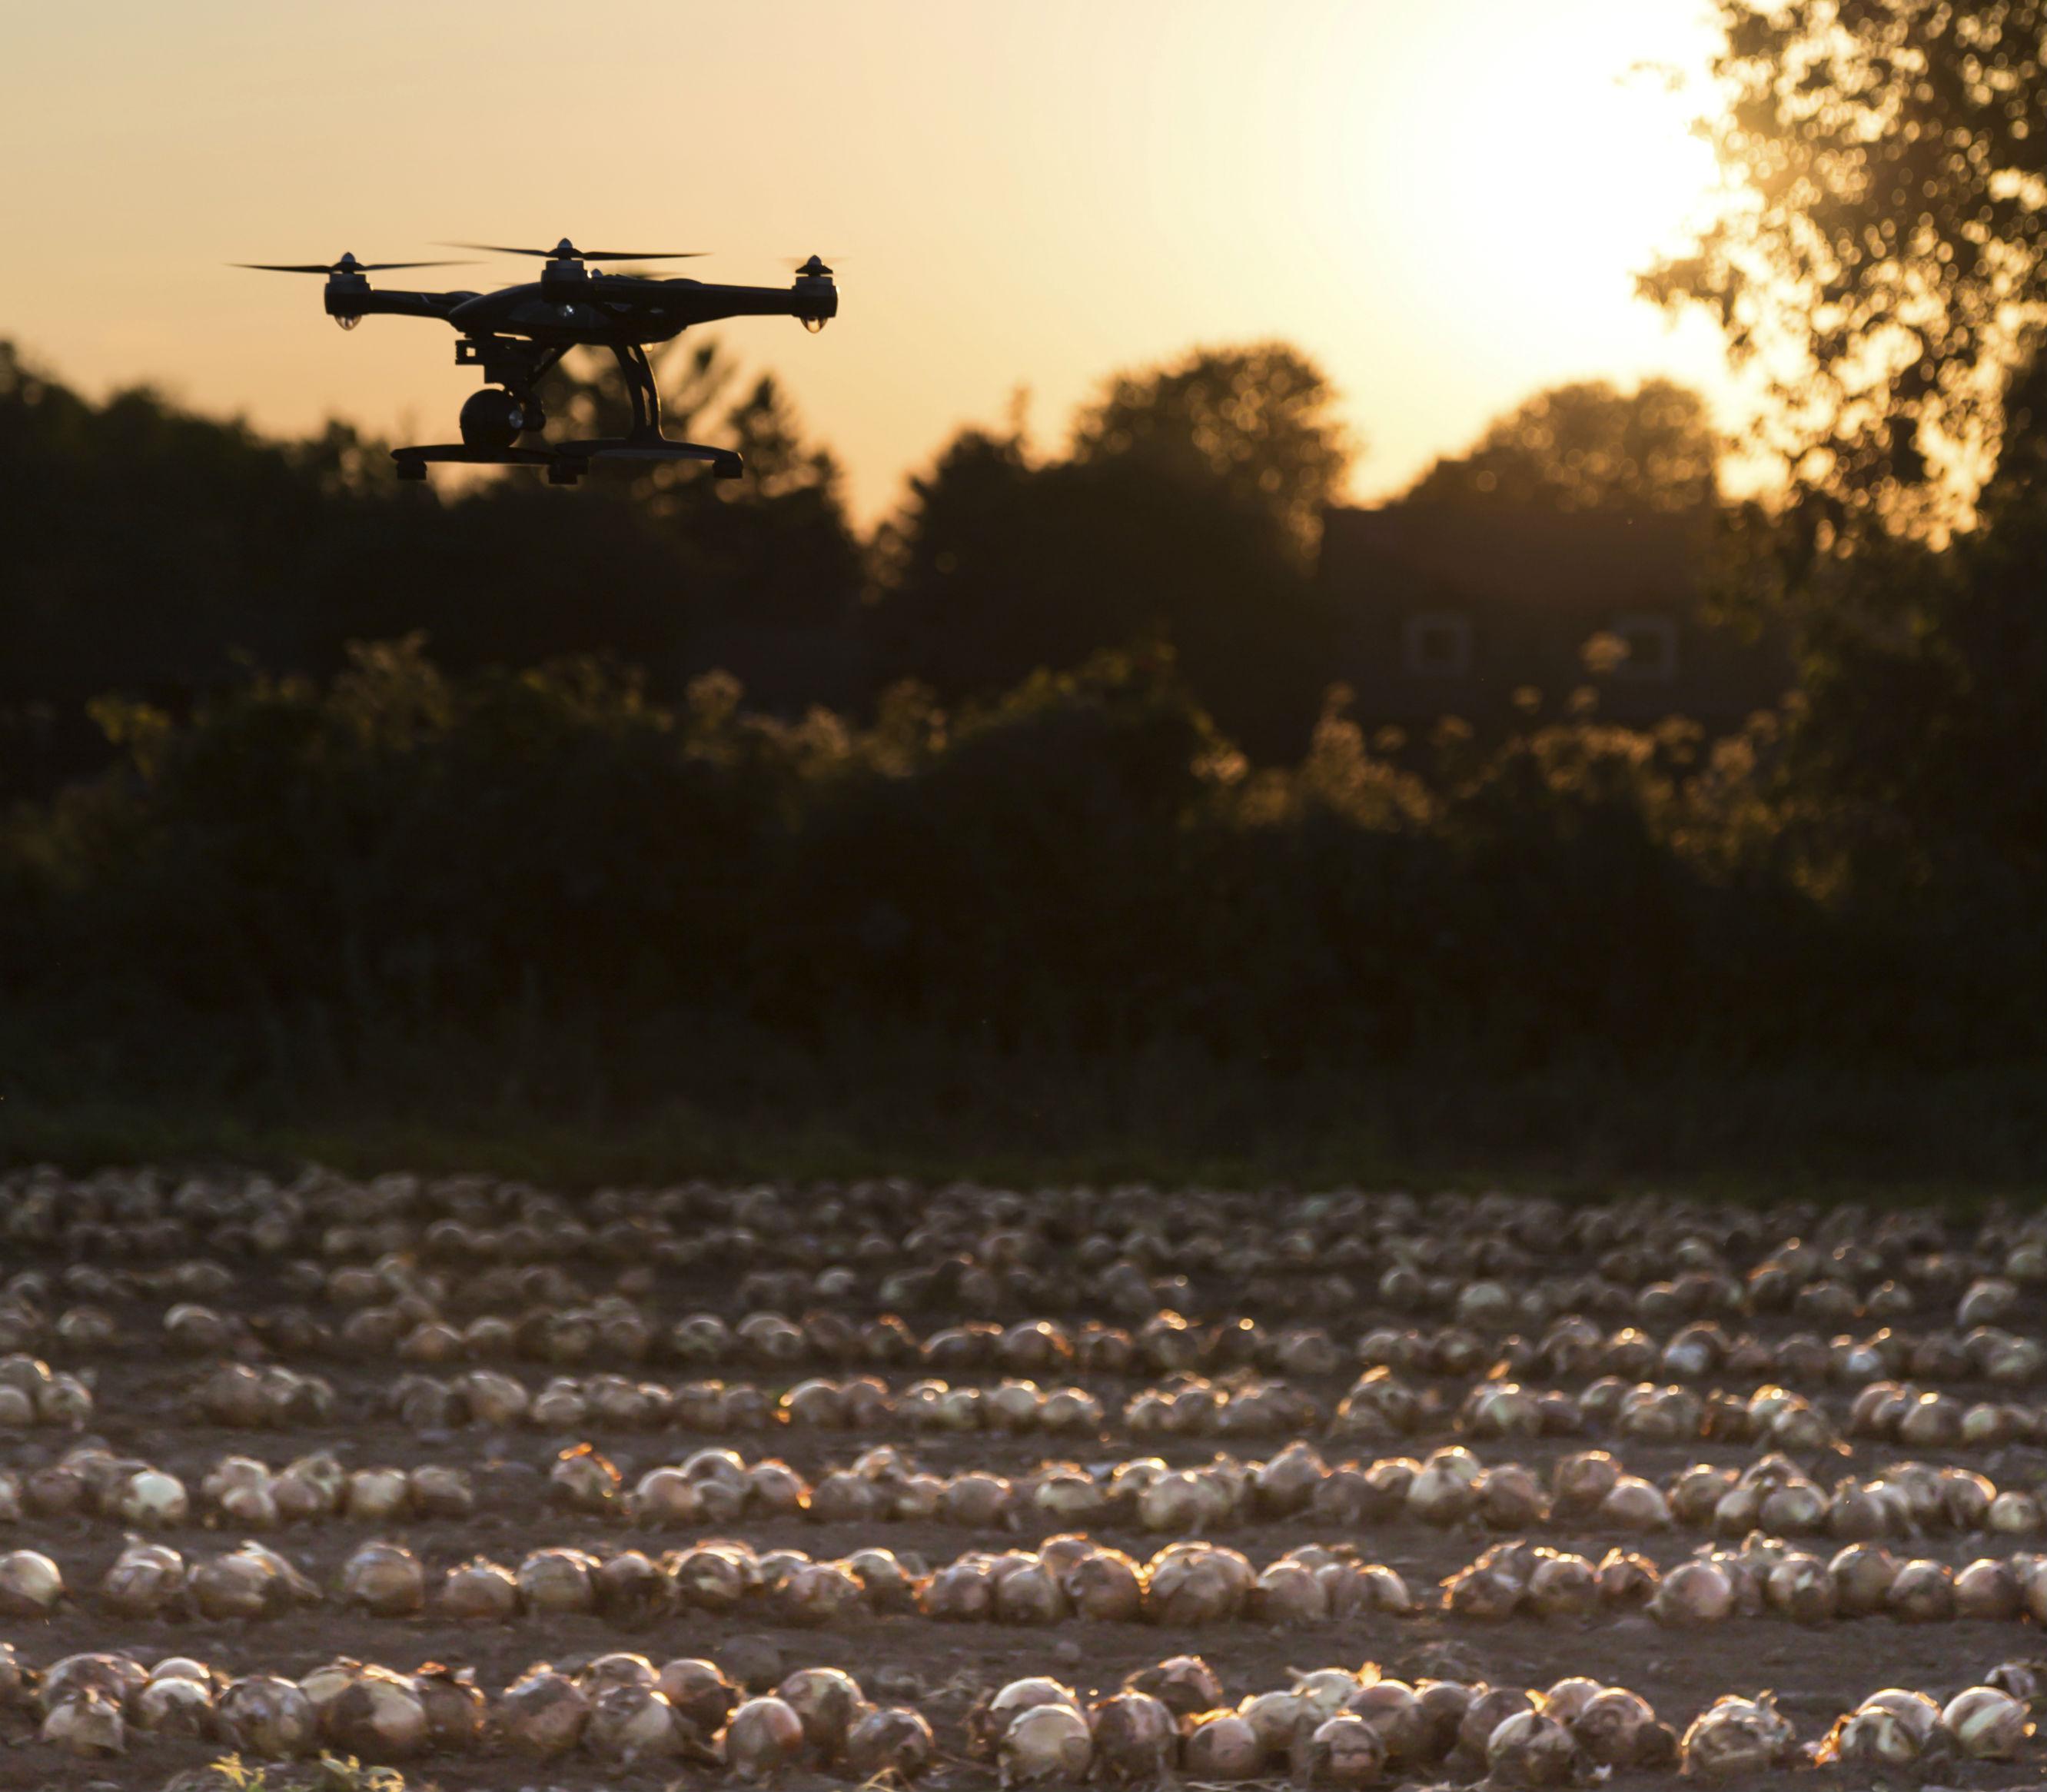 Drone-Sunset-Field-cropped.jpg